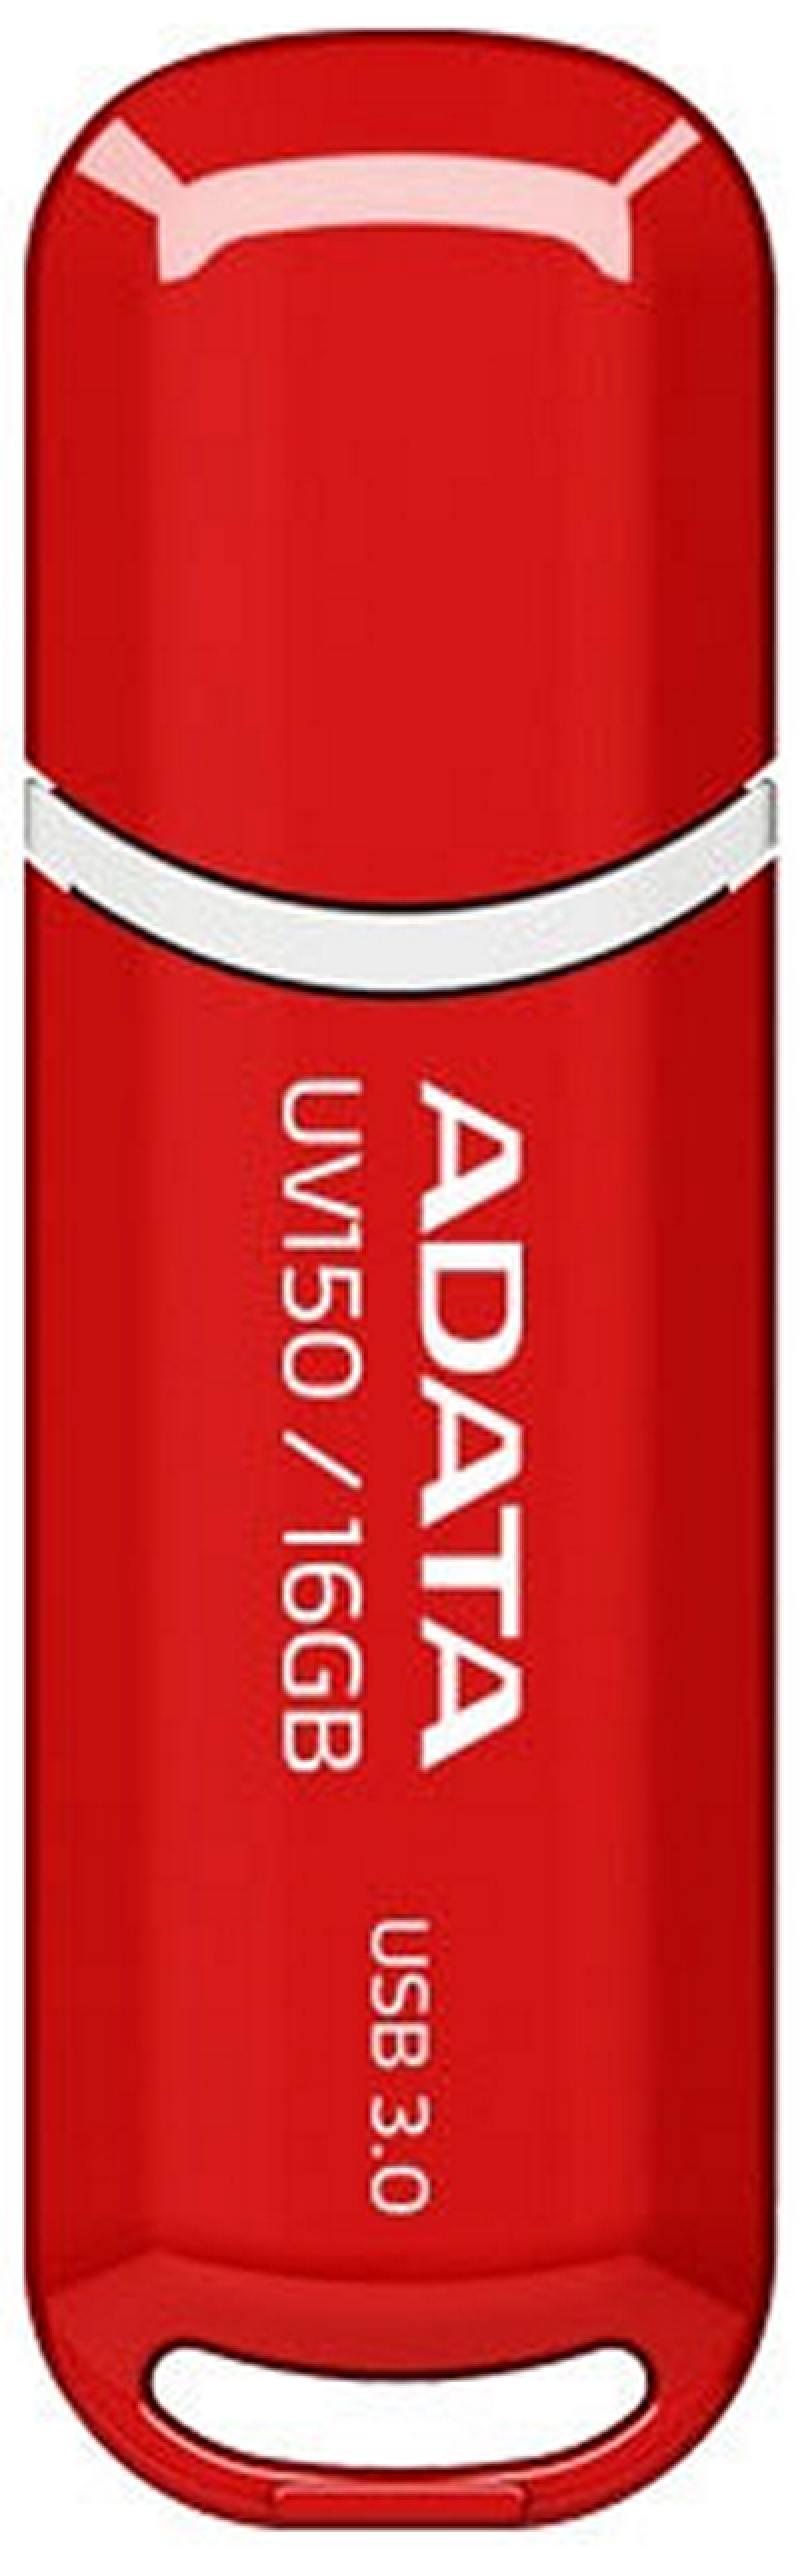 Флешка USB 16Gb A-Data UV150 USB3.0 AUV150-16G-RRD красный